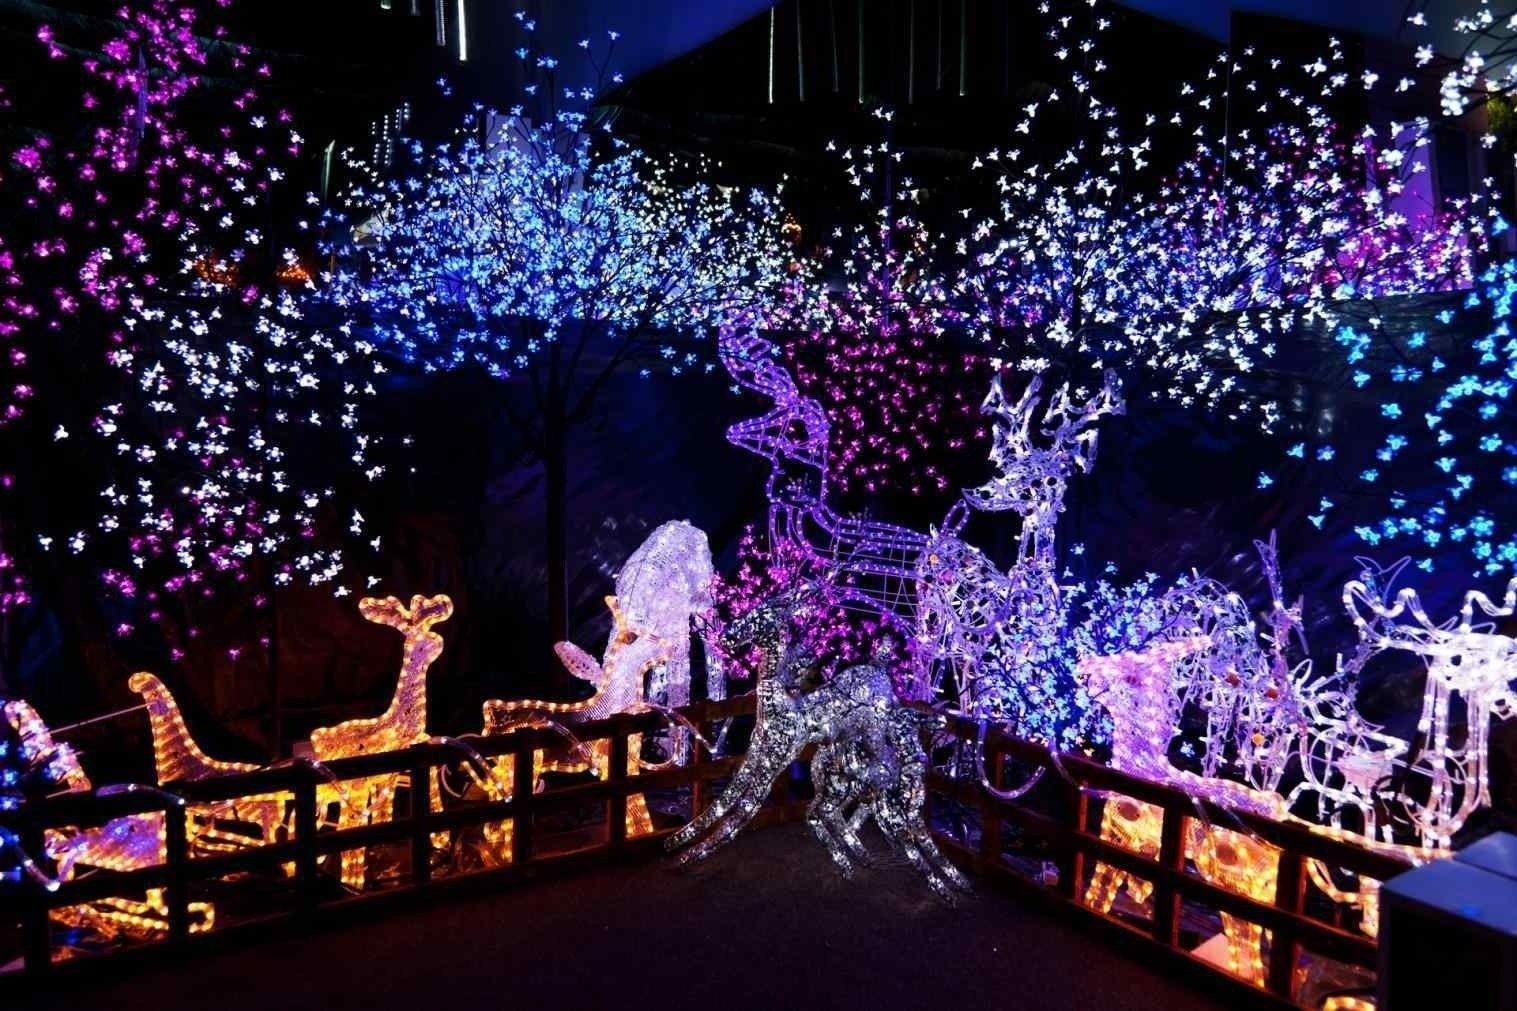 Outdoor Christmas Lighting Ideas Outdoor Christmas Lights Outdoor Christmas Tree Decorations Outdoor Christmas Diy